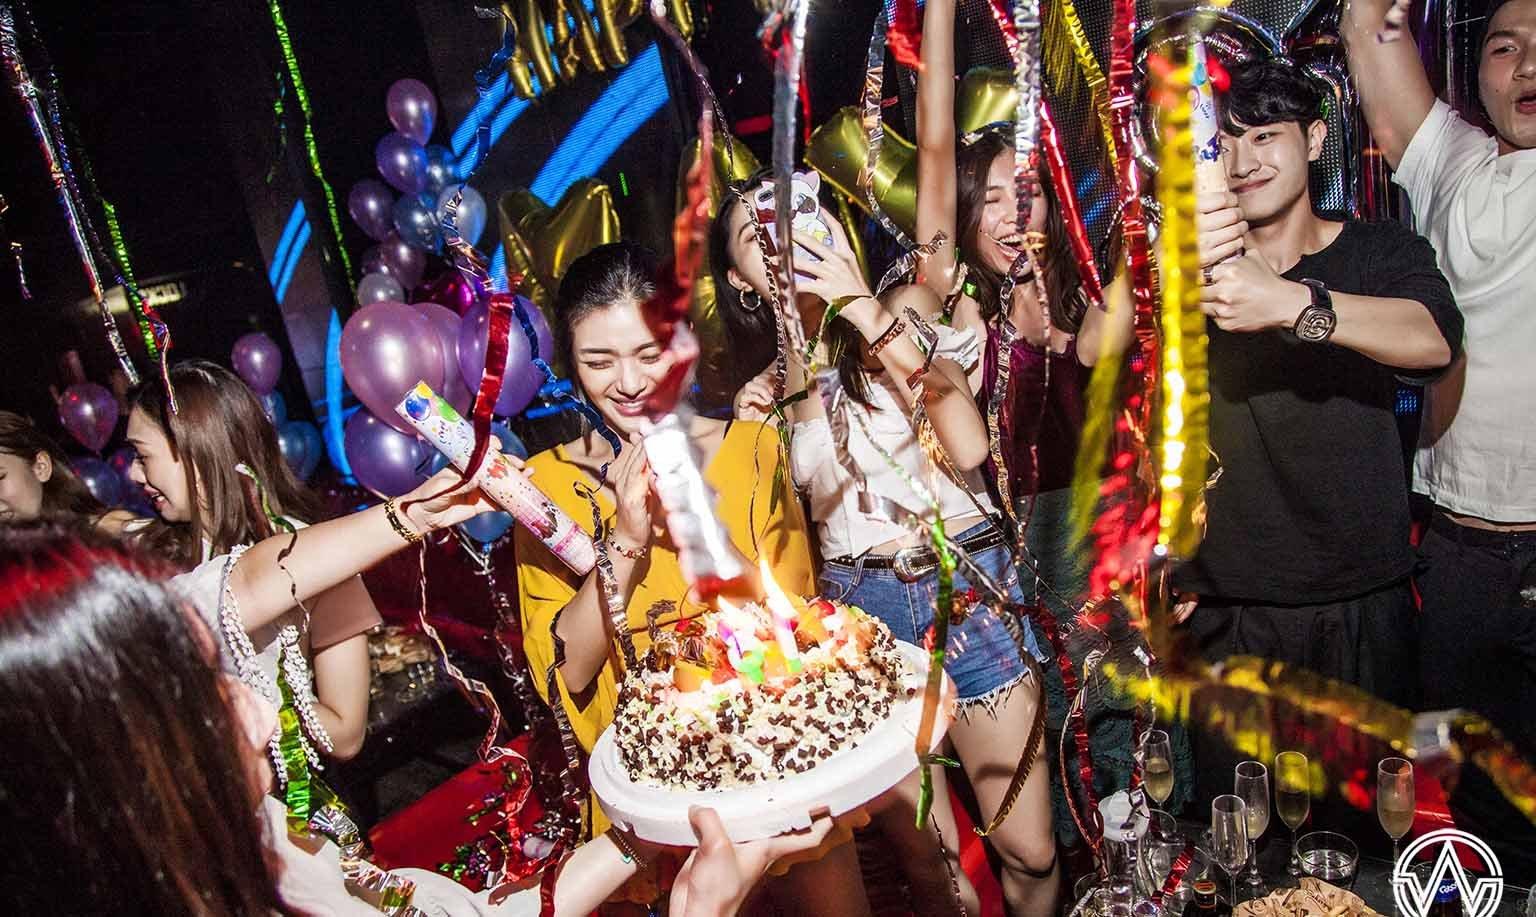 WAVE Club | 台北101/世貿站-女生暢飲 | VIP通道入場 | 直擊 101 煙火